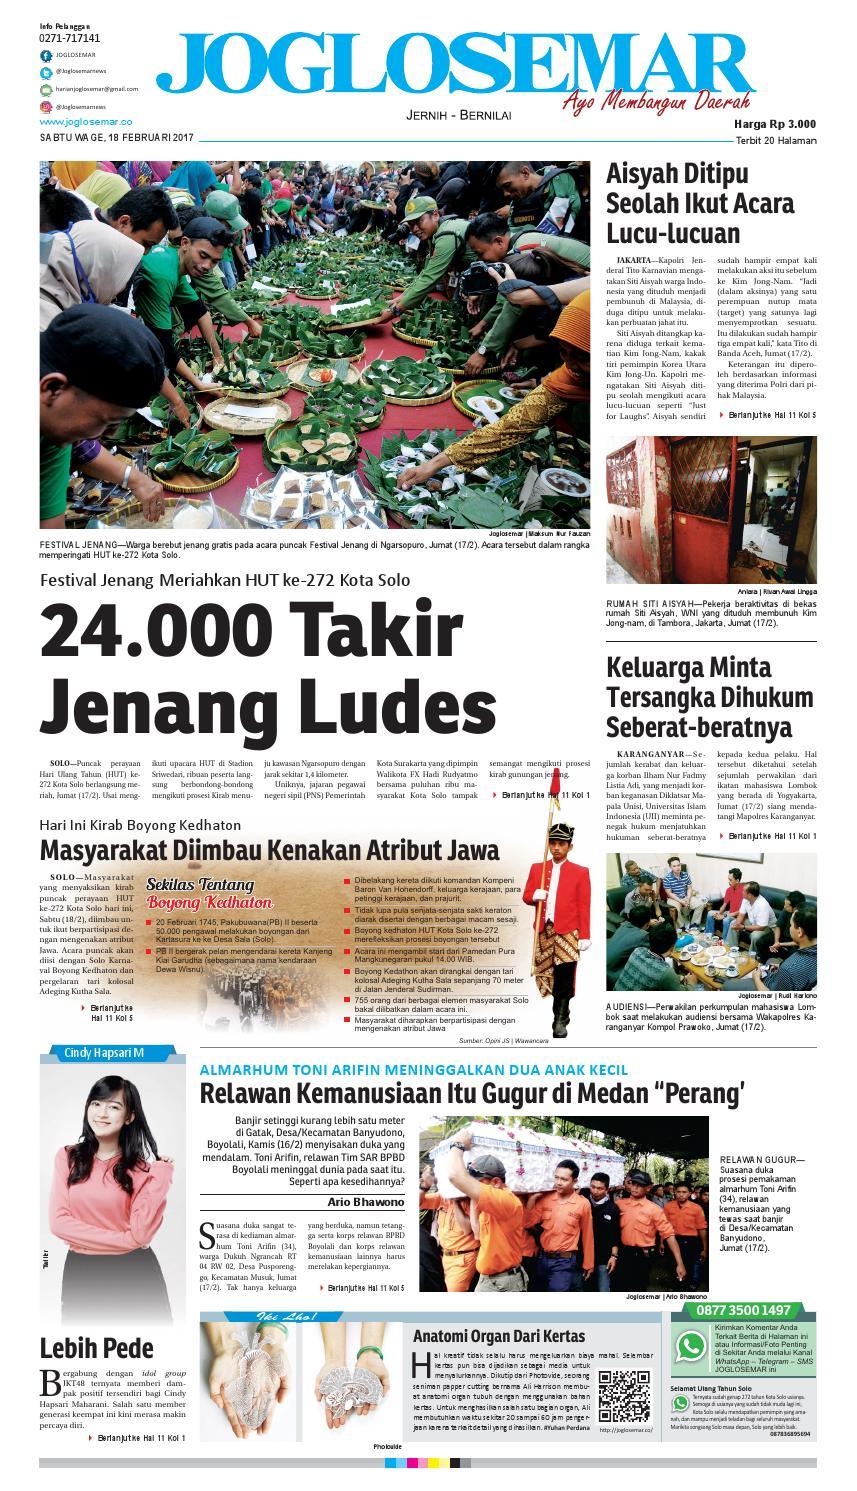 E paper 18 februari 2017 by PT Joglosemar Prima Media - issuu 594b57db78